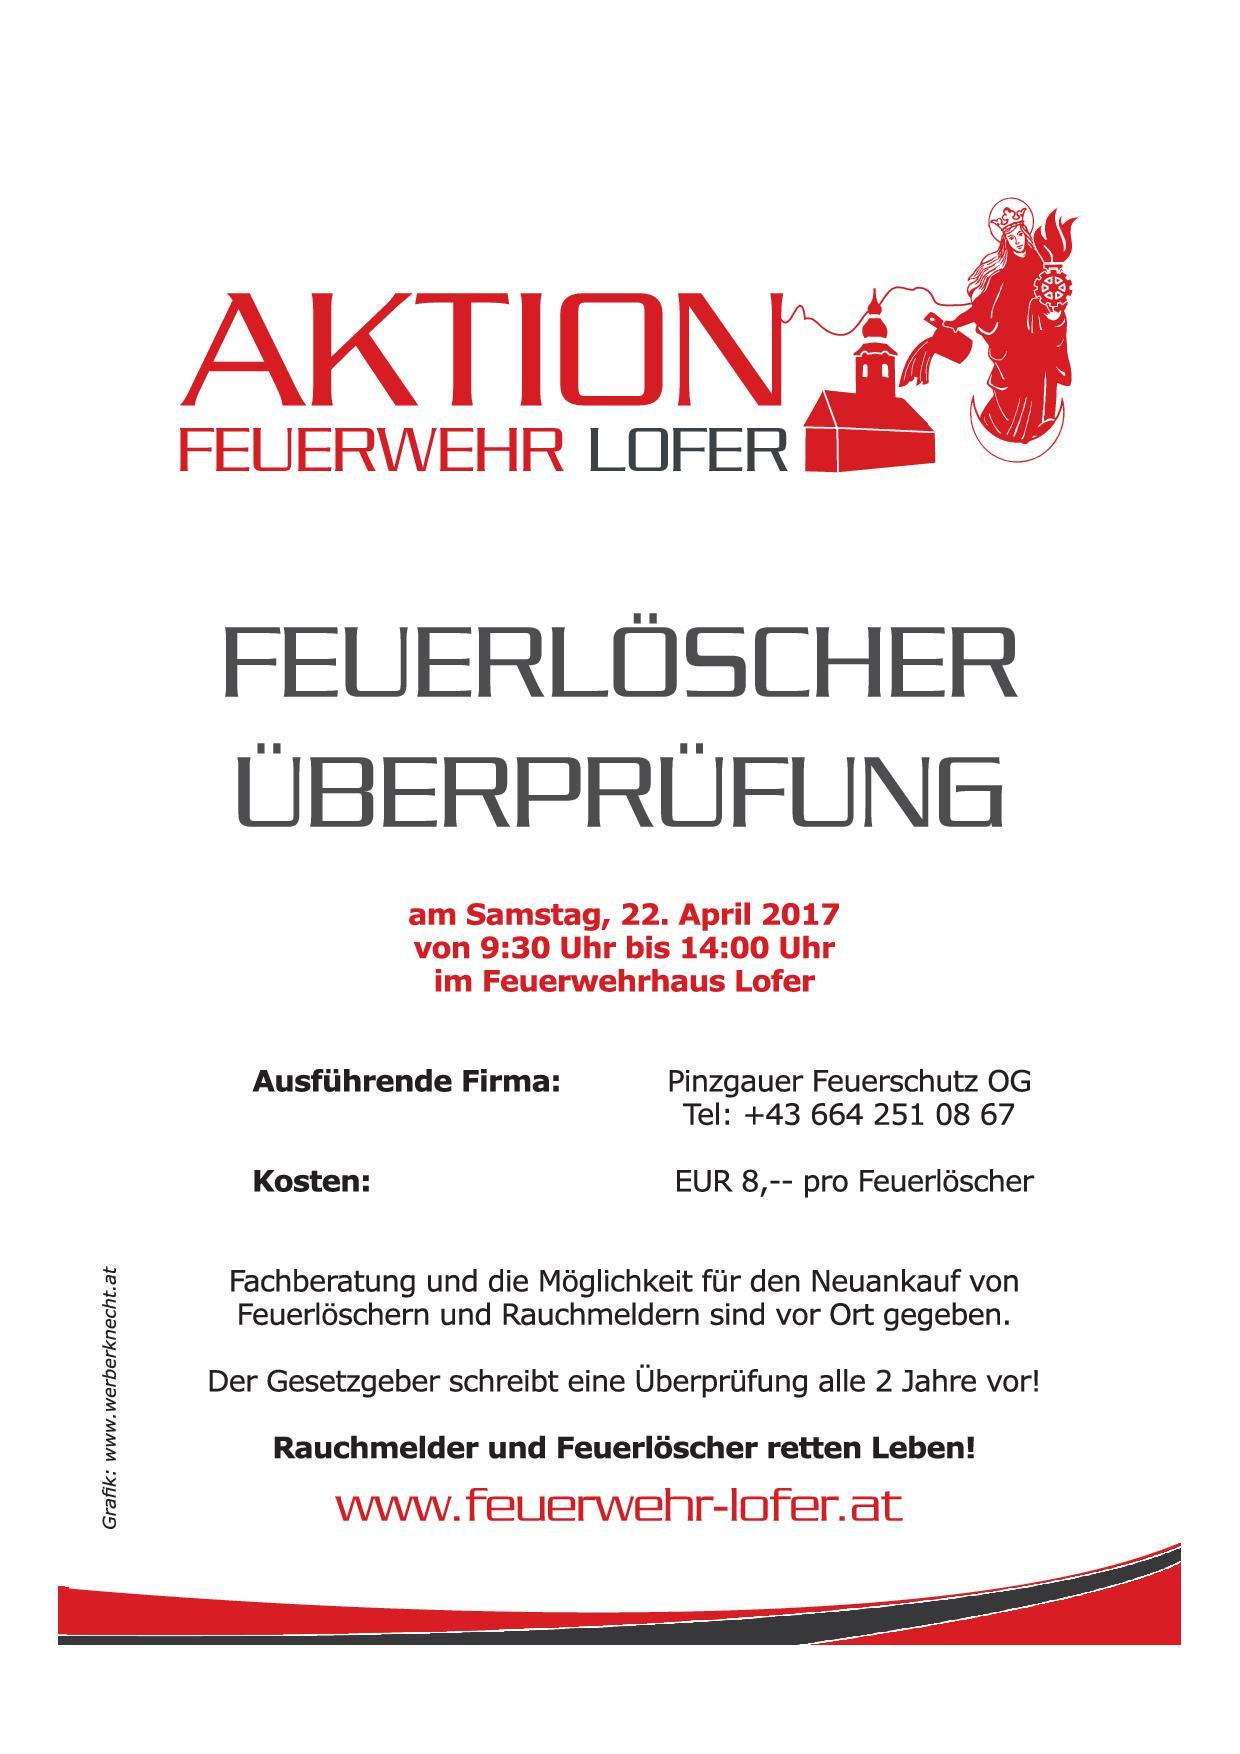 Feuerlöscherüberprüfung, am 22. April 2017